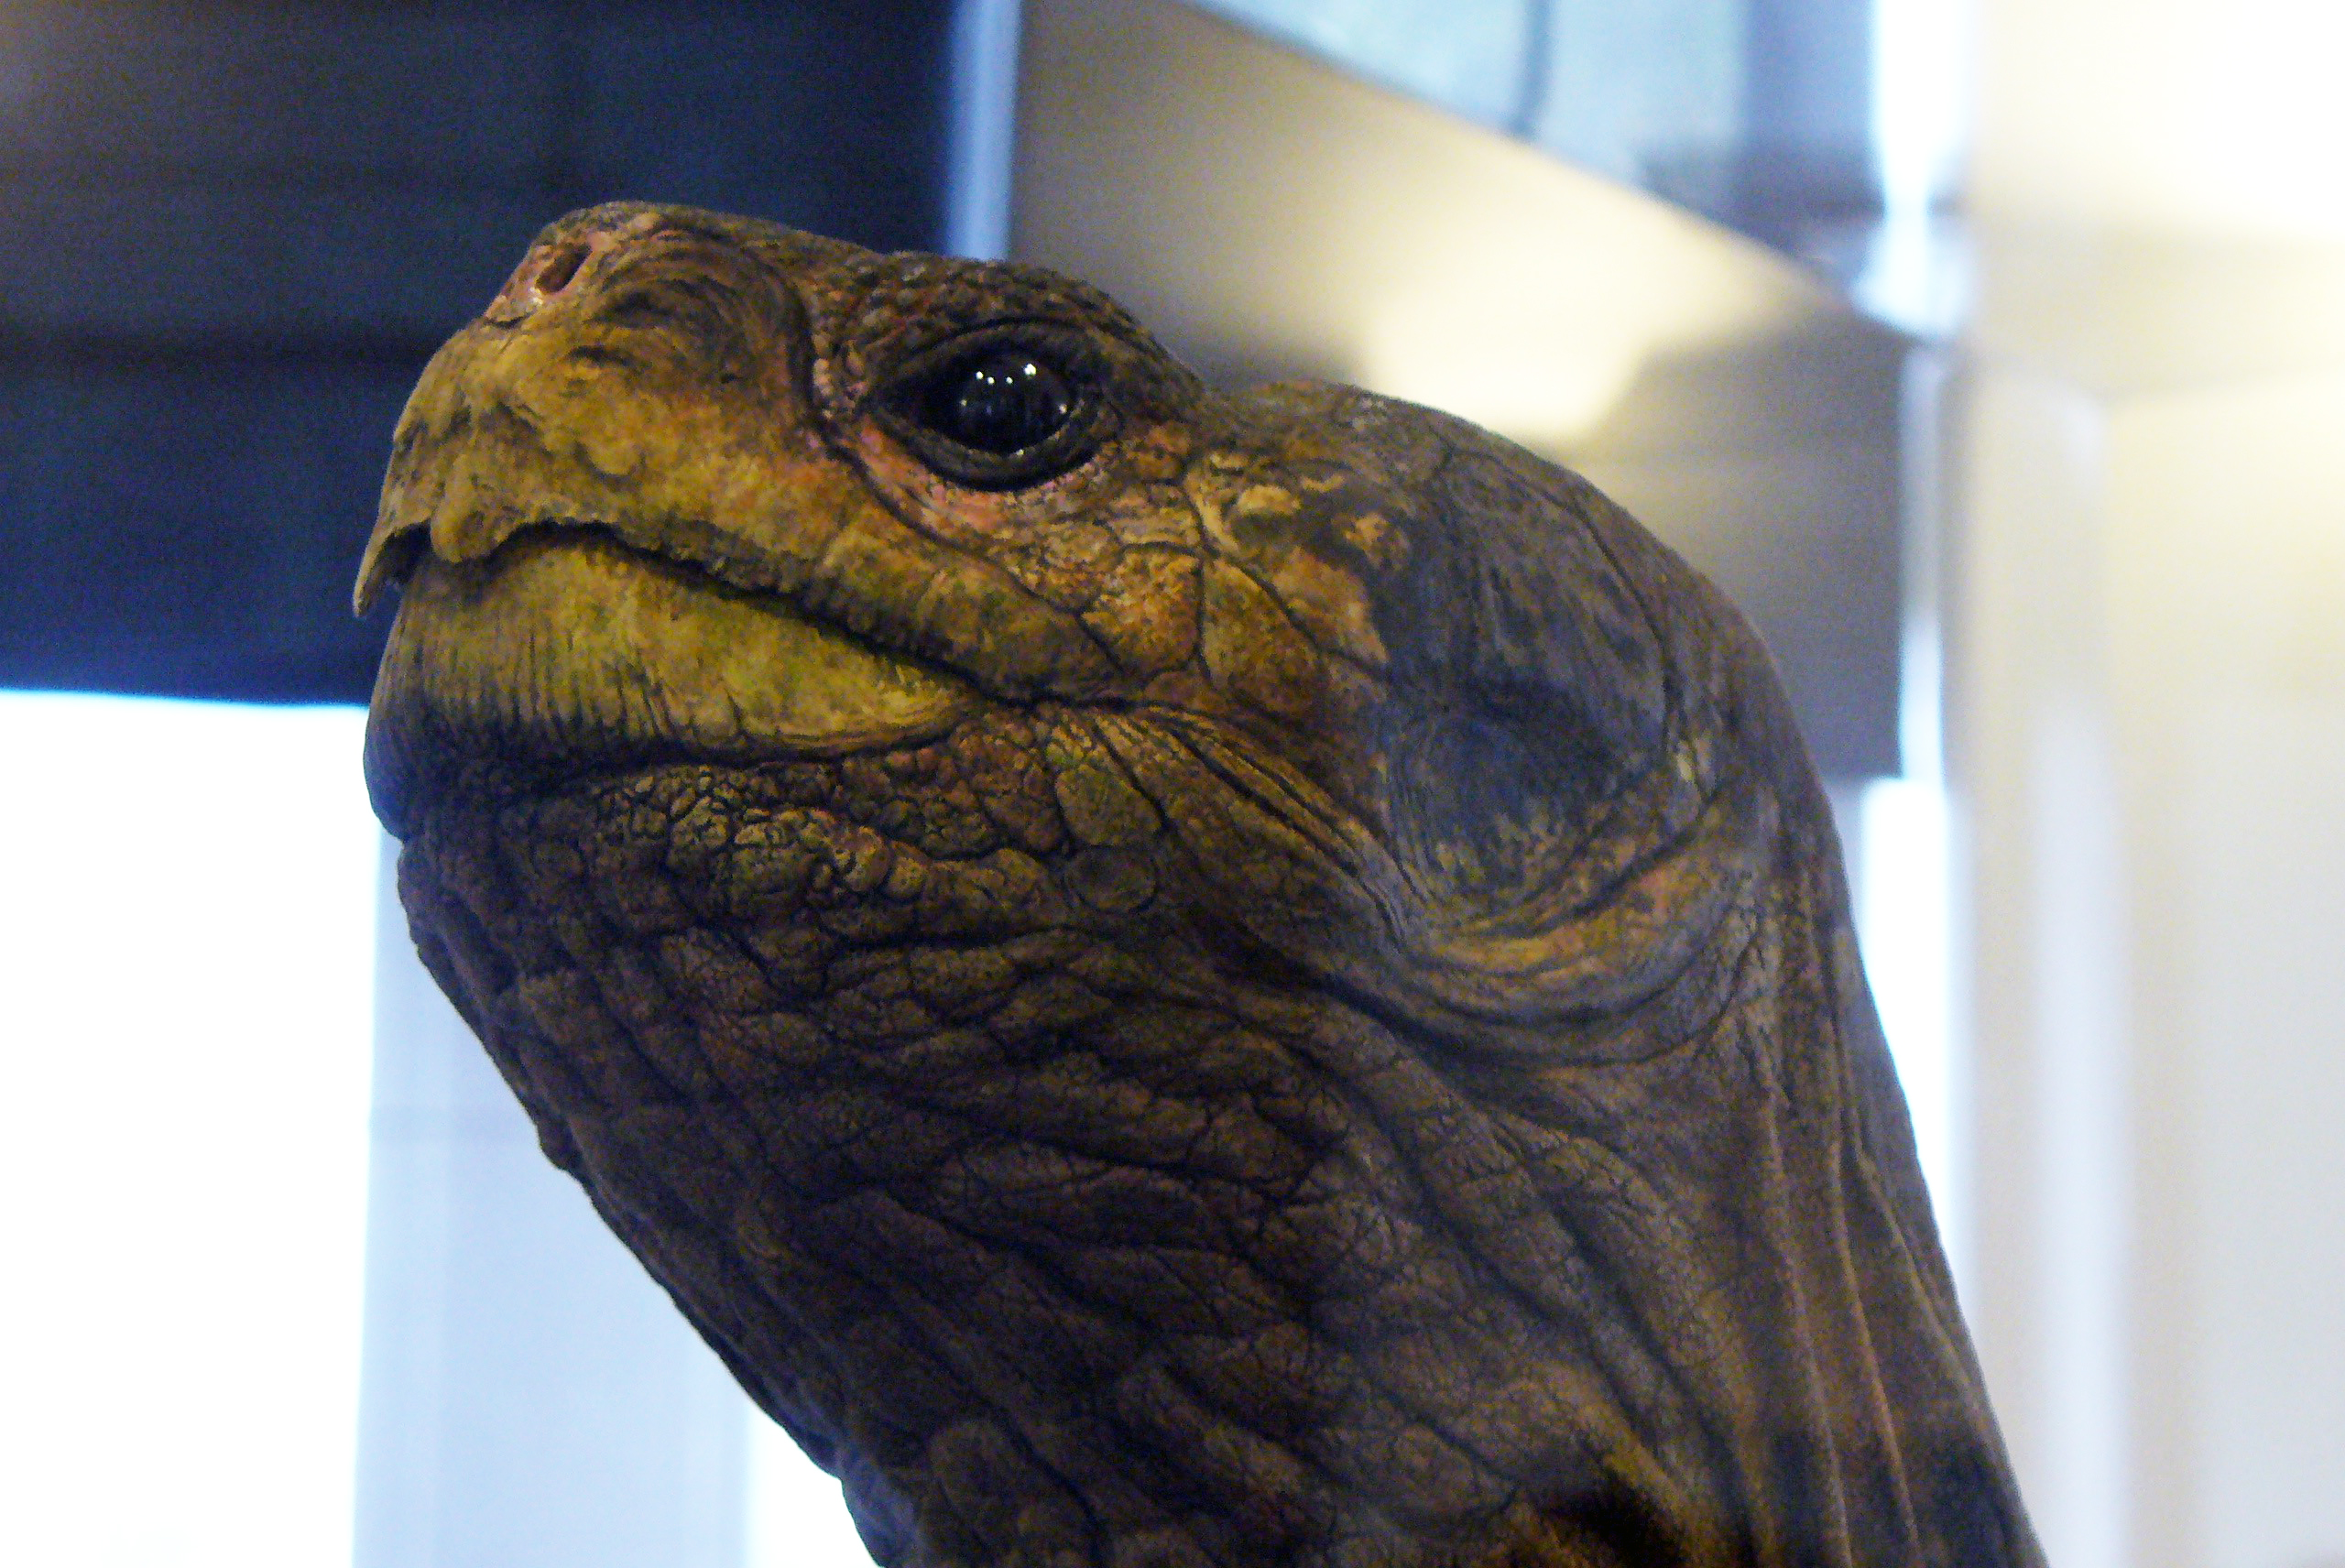 Auf Schildkrötensafari mit Elke Wallrapp (Folge 26)